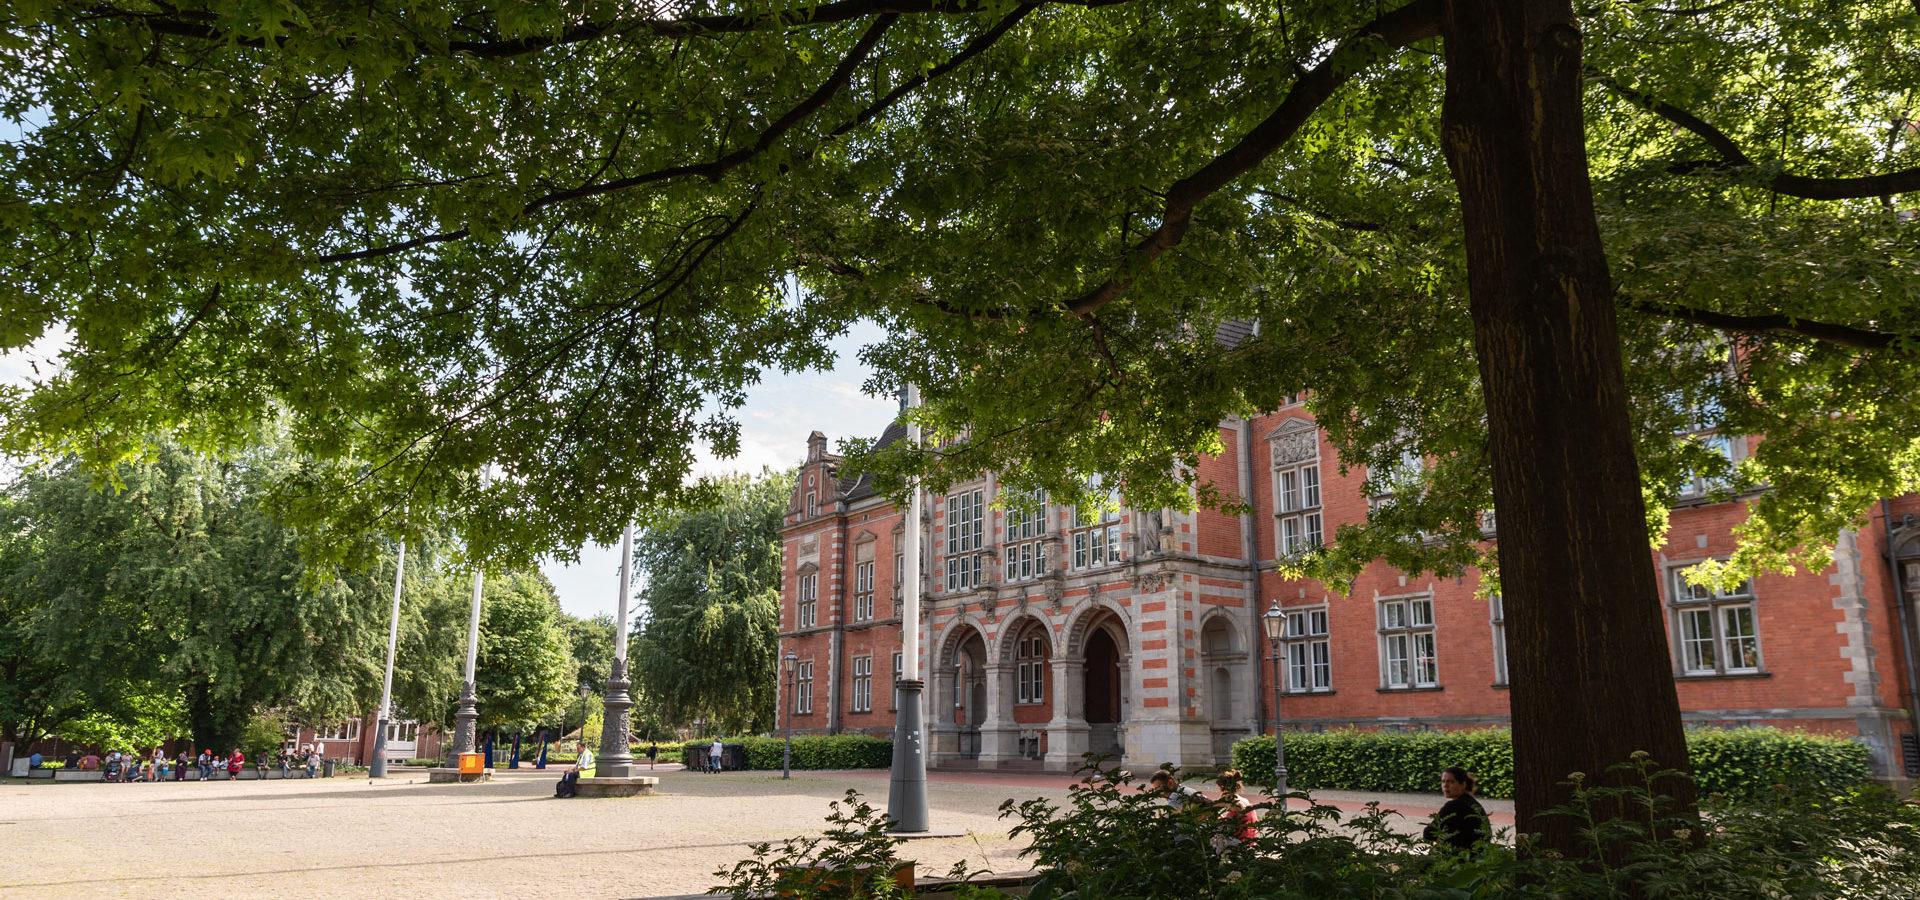 Rathaus Harburg